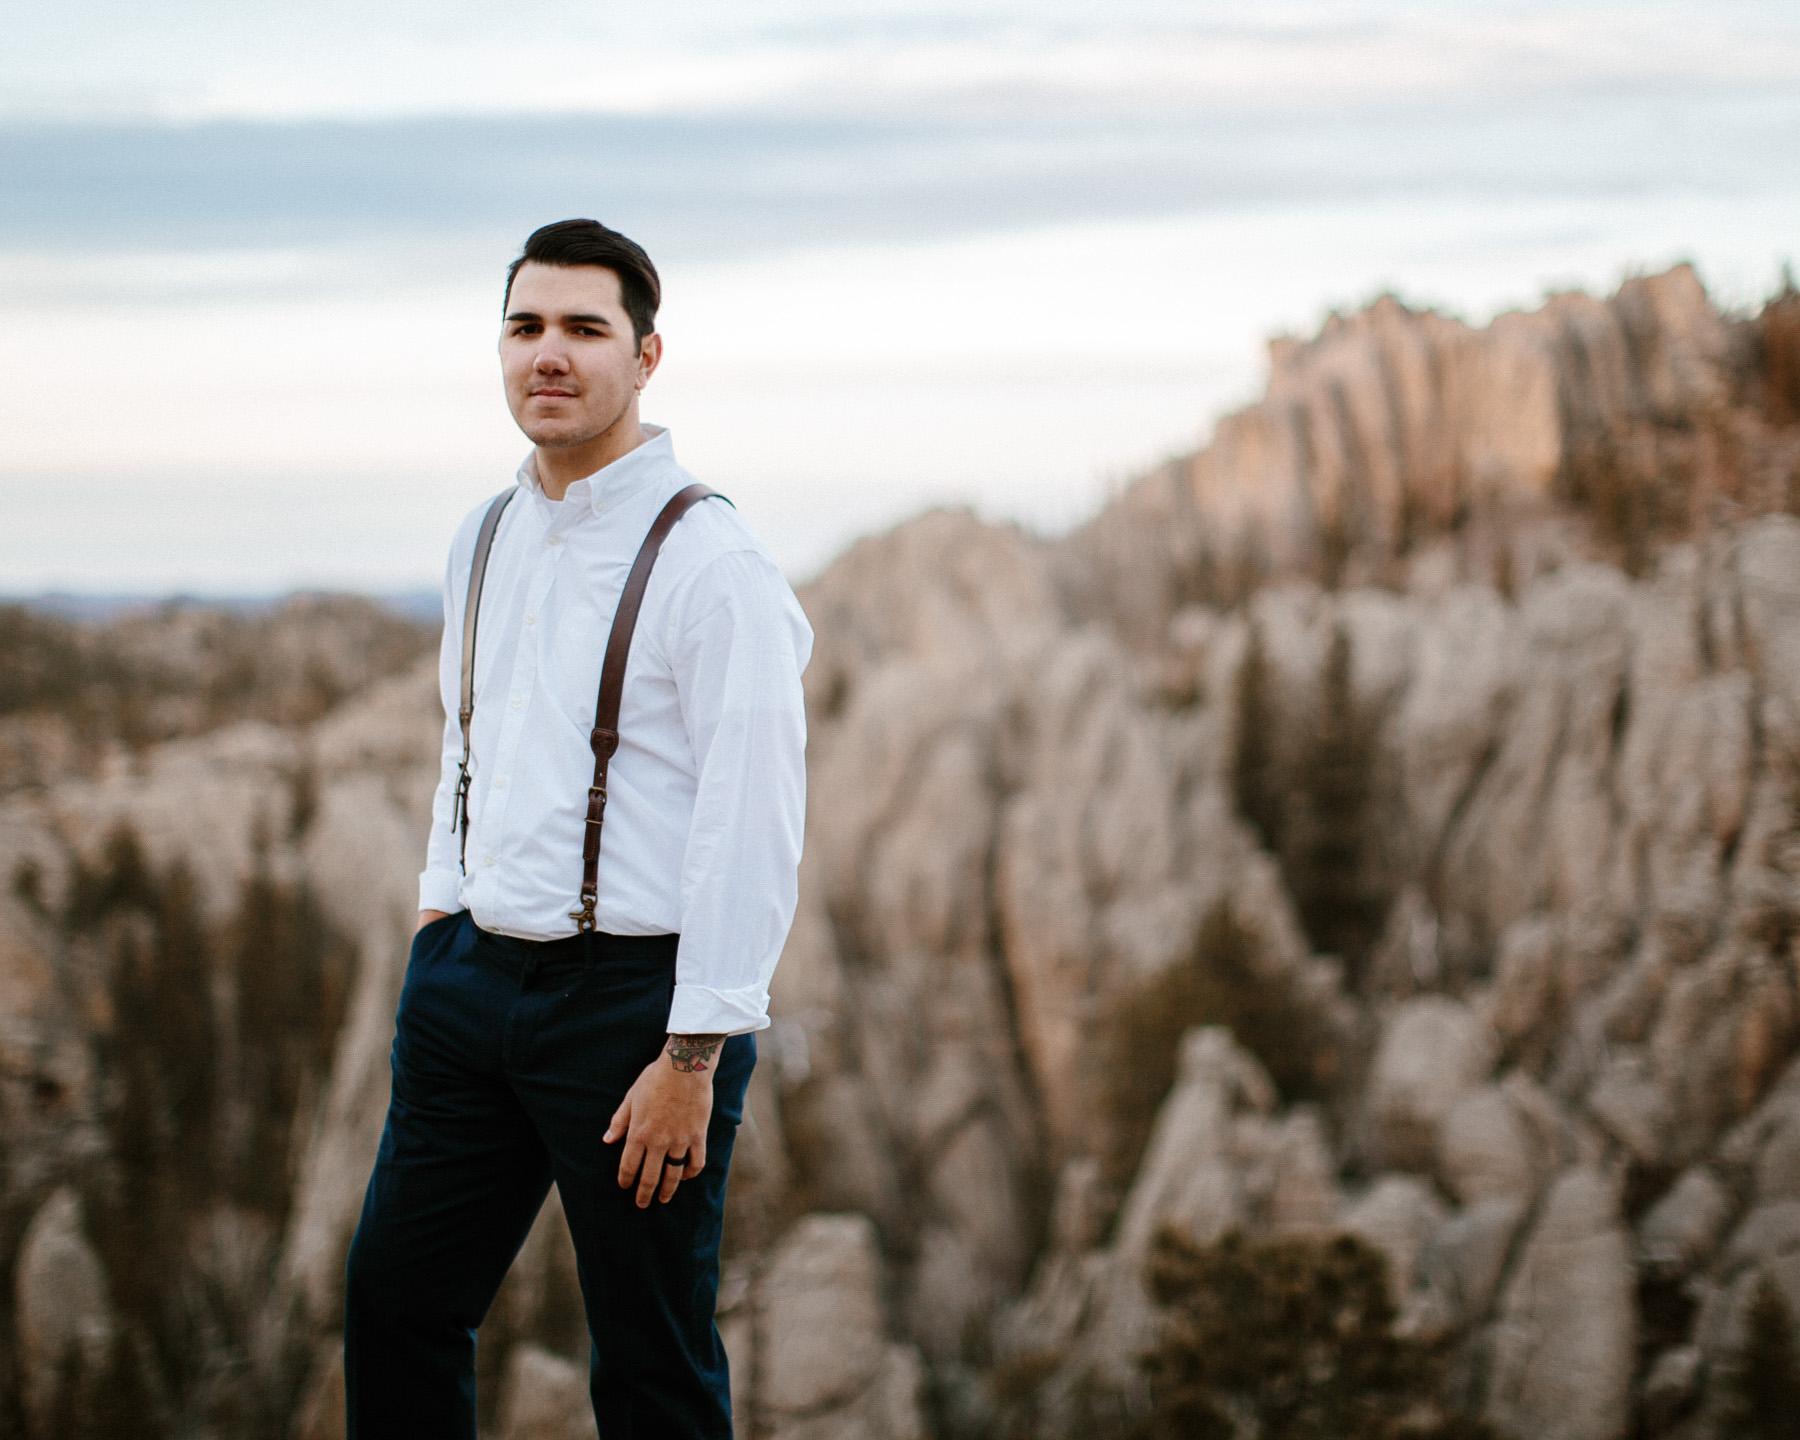 sioux-falls-black-hills-rapid-city-elopement-wedding-adventure-photographer-custer-sylvan-lake-59.jpg